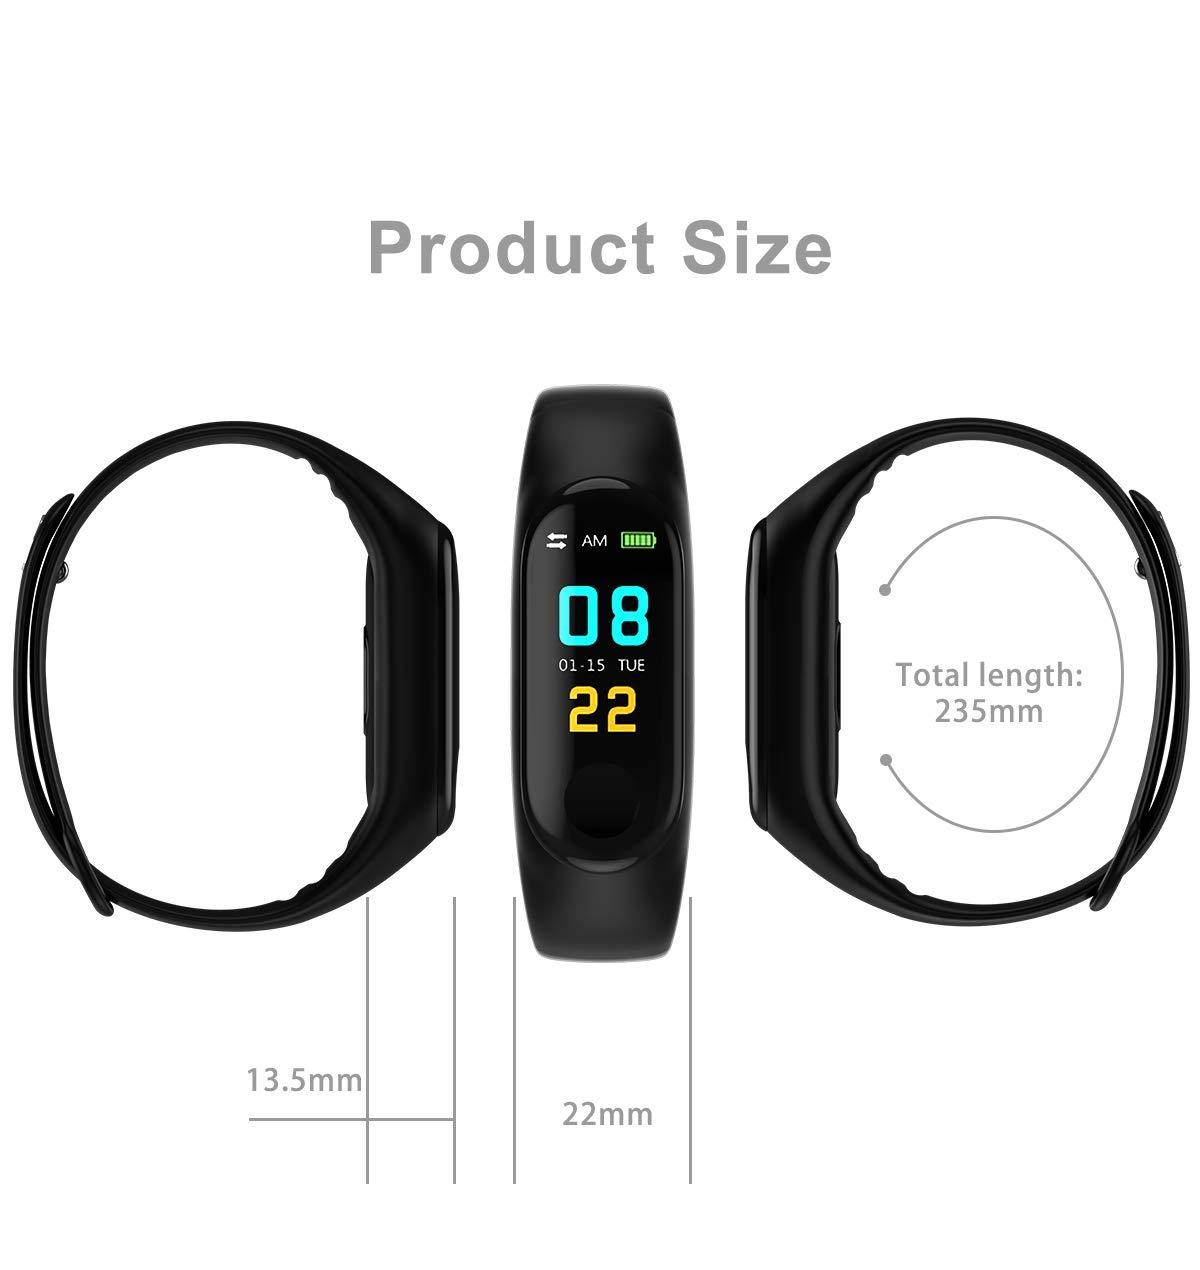 SAILINE Fitness Tracker Heart Rate Fitness Wristband Smart Watch Waterproof IPX6 Activity Tracker Blood Pressure Smart Bracelet with Stopwatch Sport GPS Pedometer Women Men (Black)